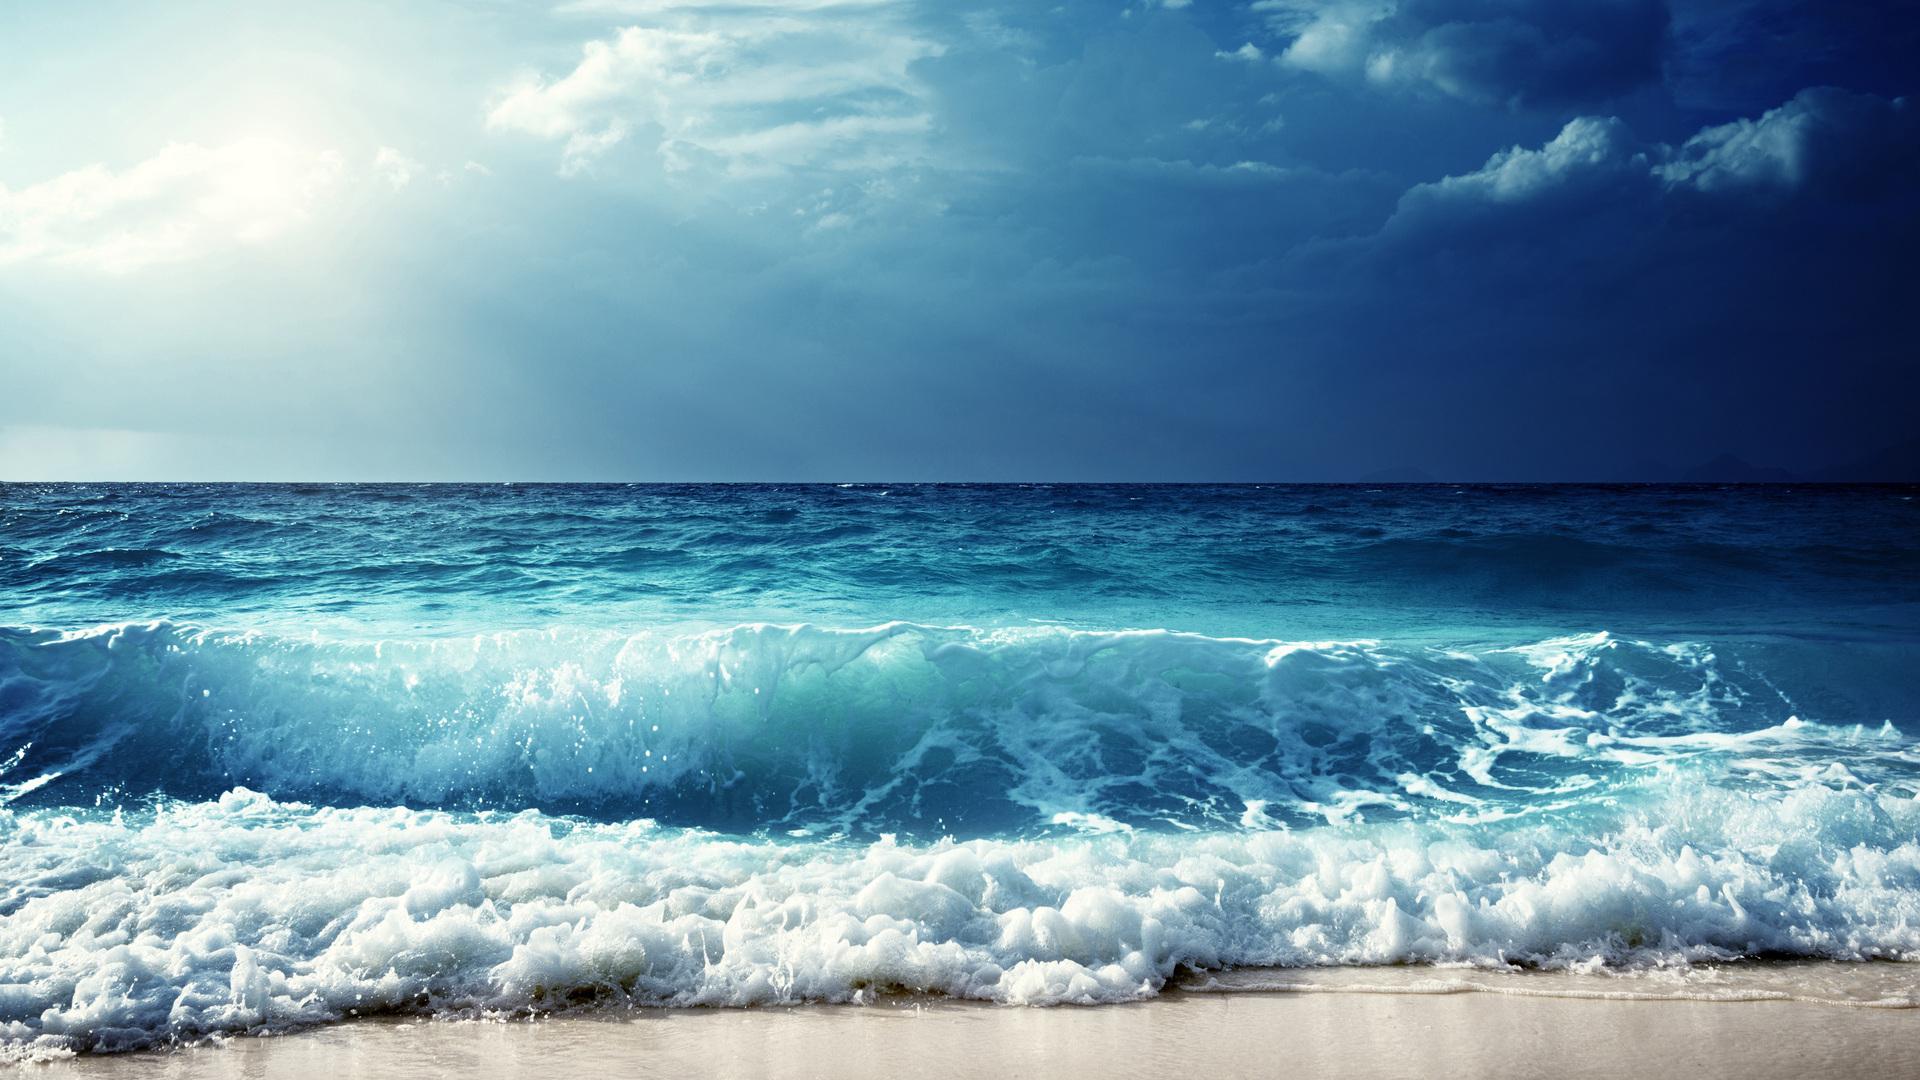 sky-sea-waves-horizon-5k-9v.jpg